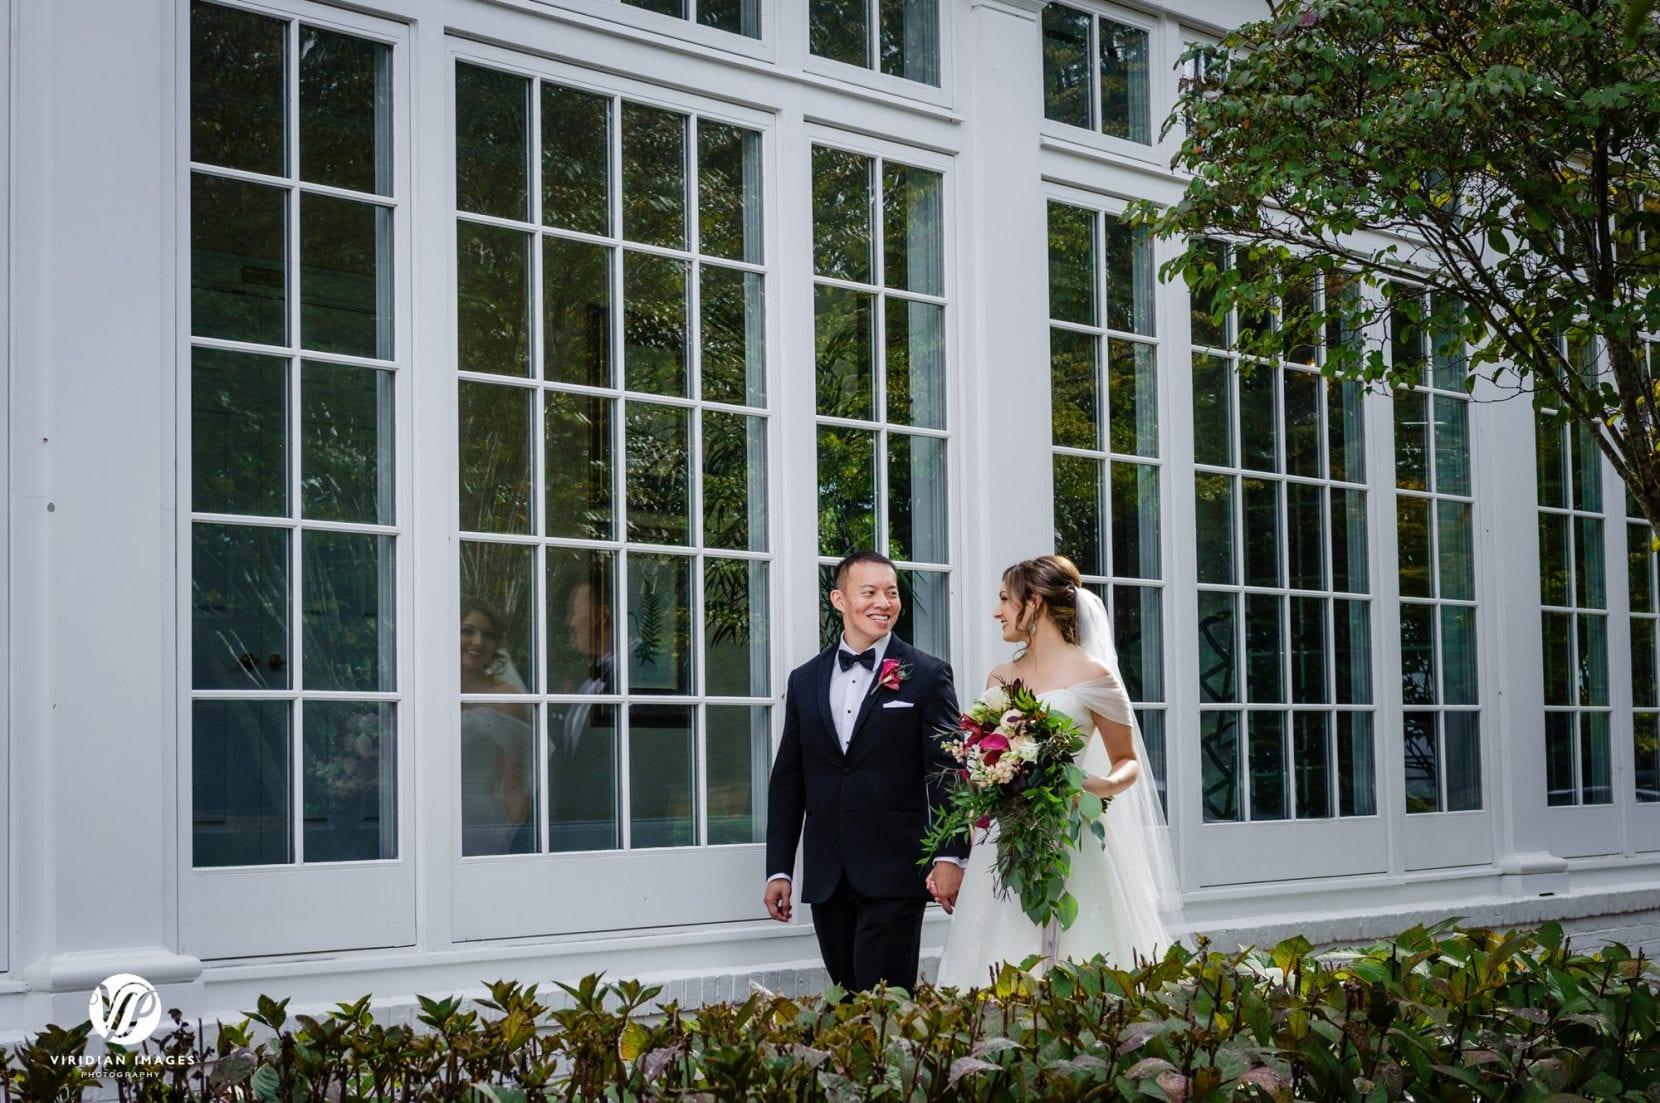 couple walking by windows